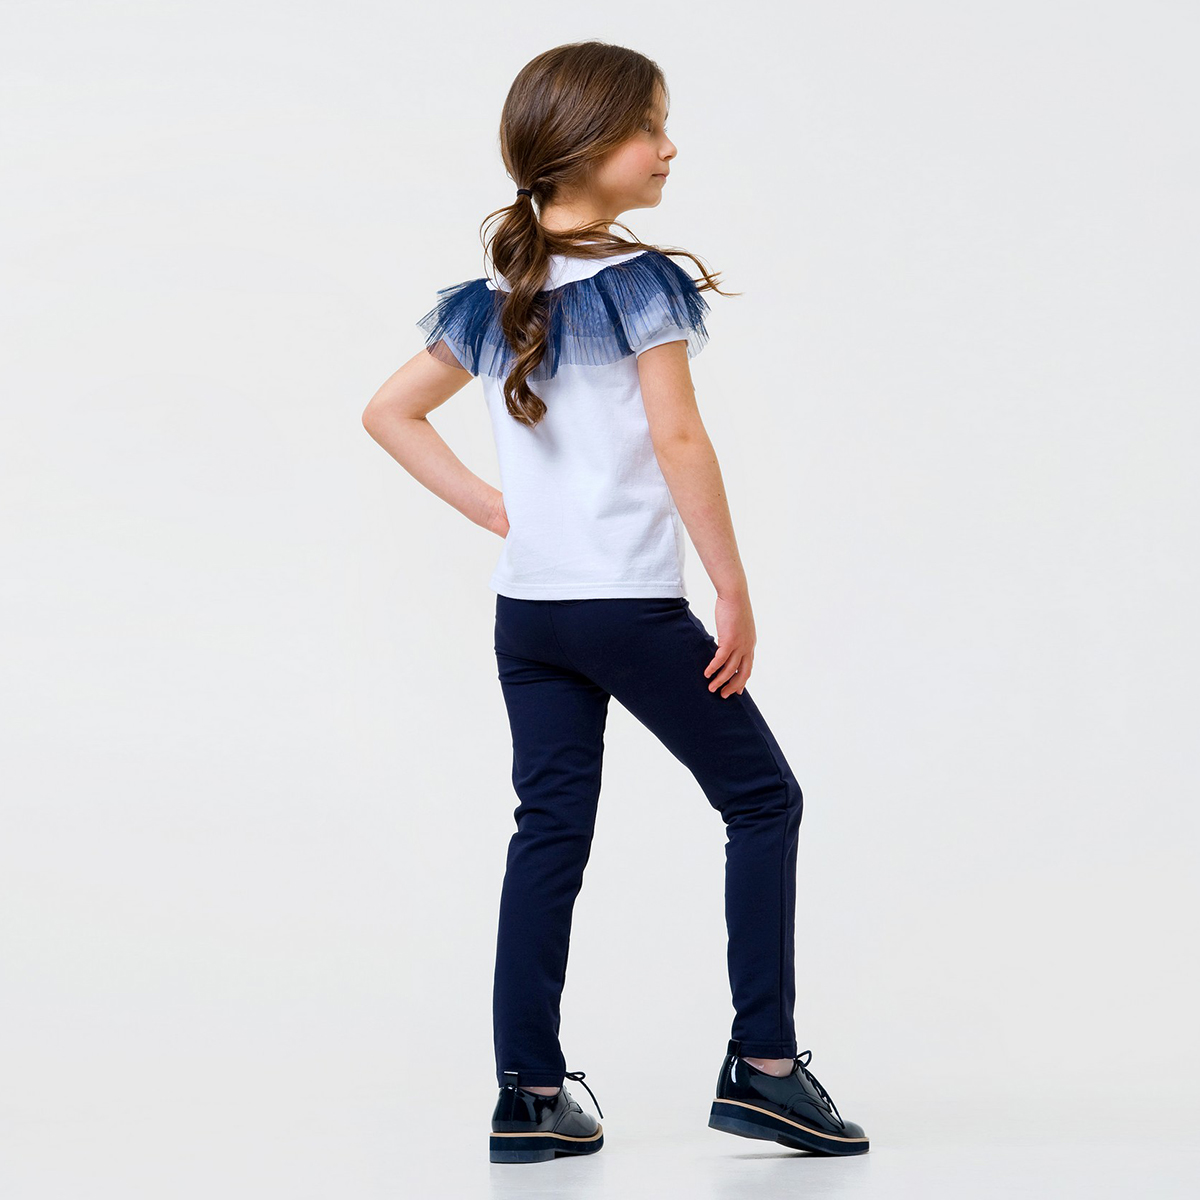 Купить Брюки, джинсы, шорты, Брюки Smil Stretch Blue, р. 128 115425 ТМ: SMIL, синий